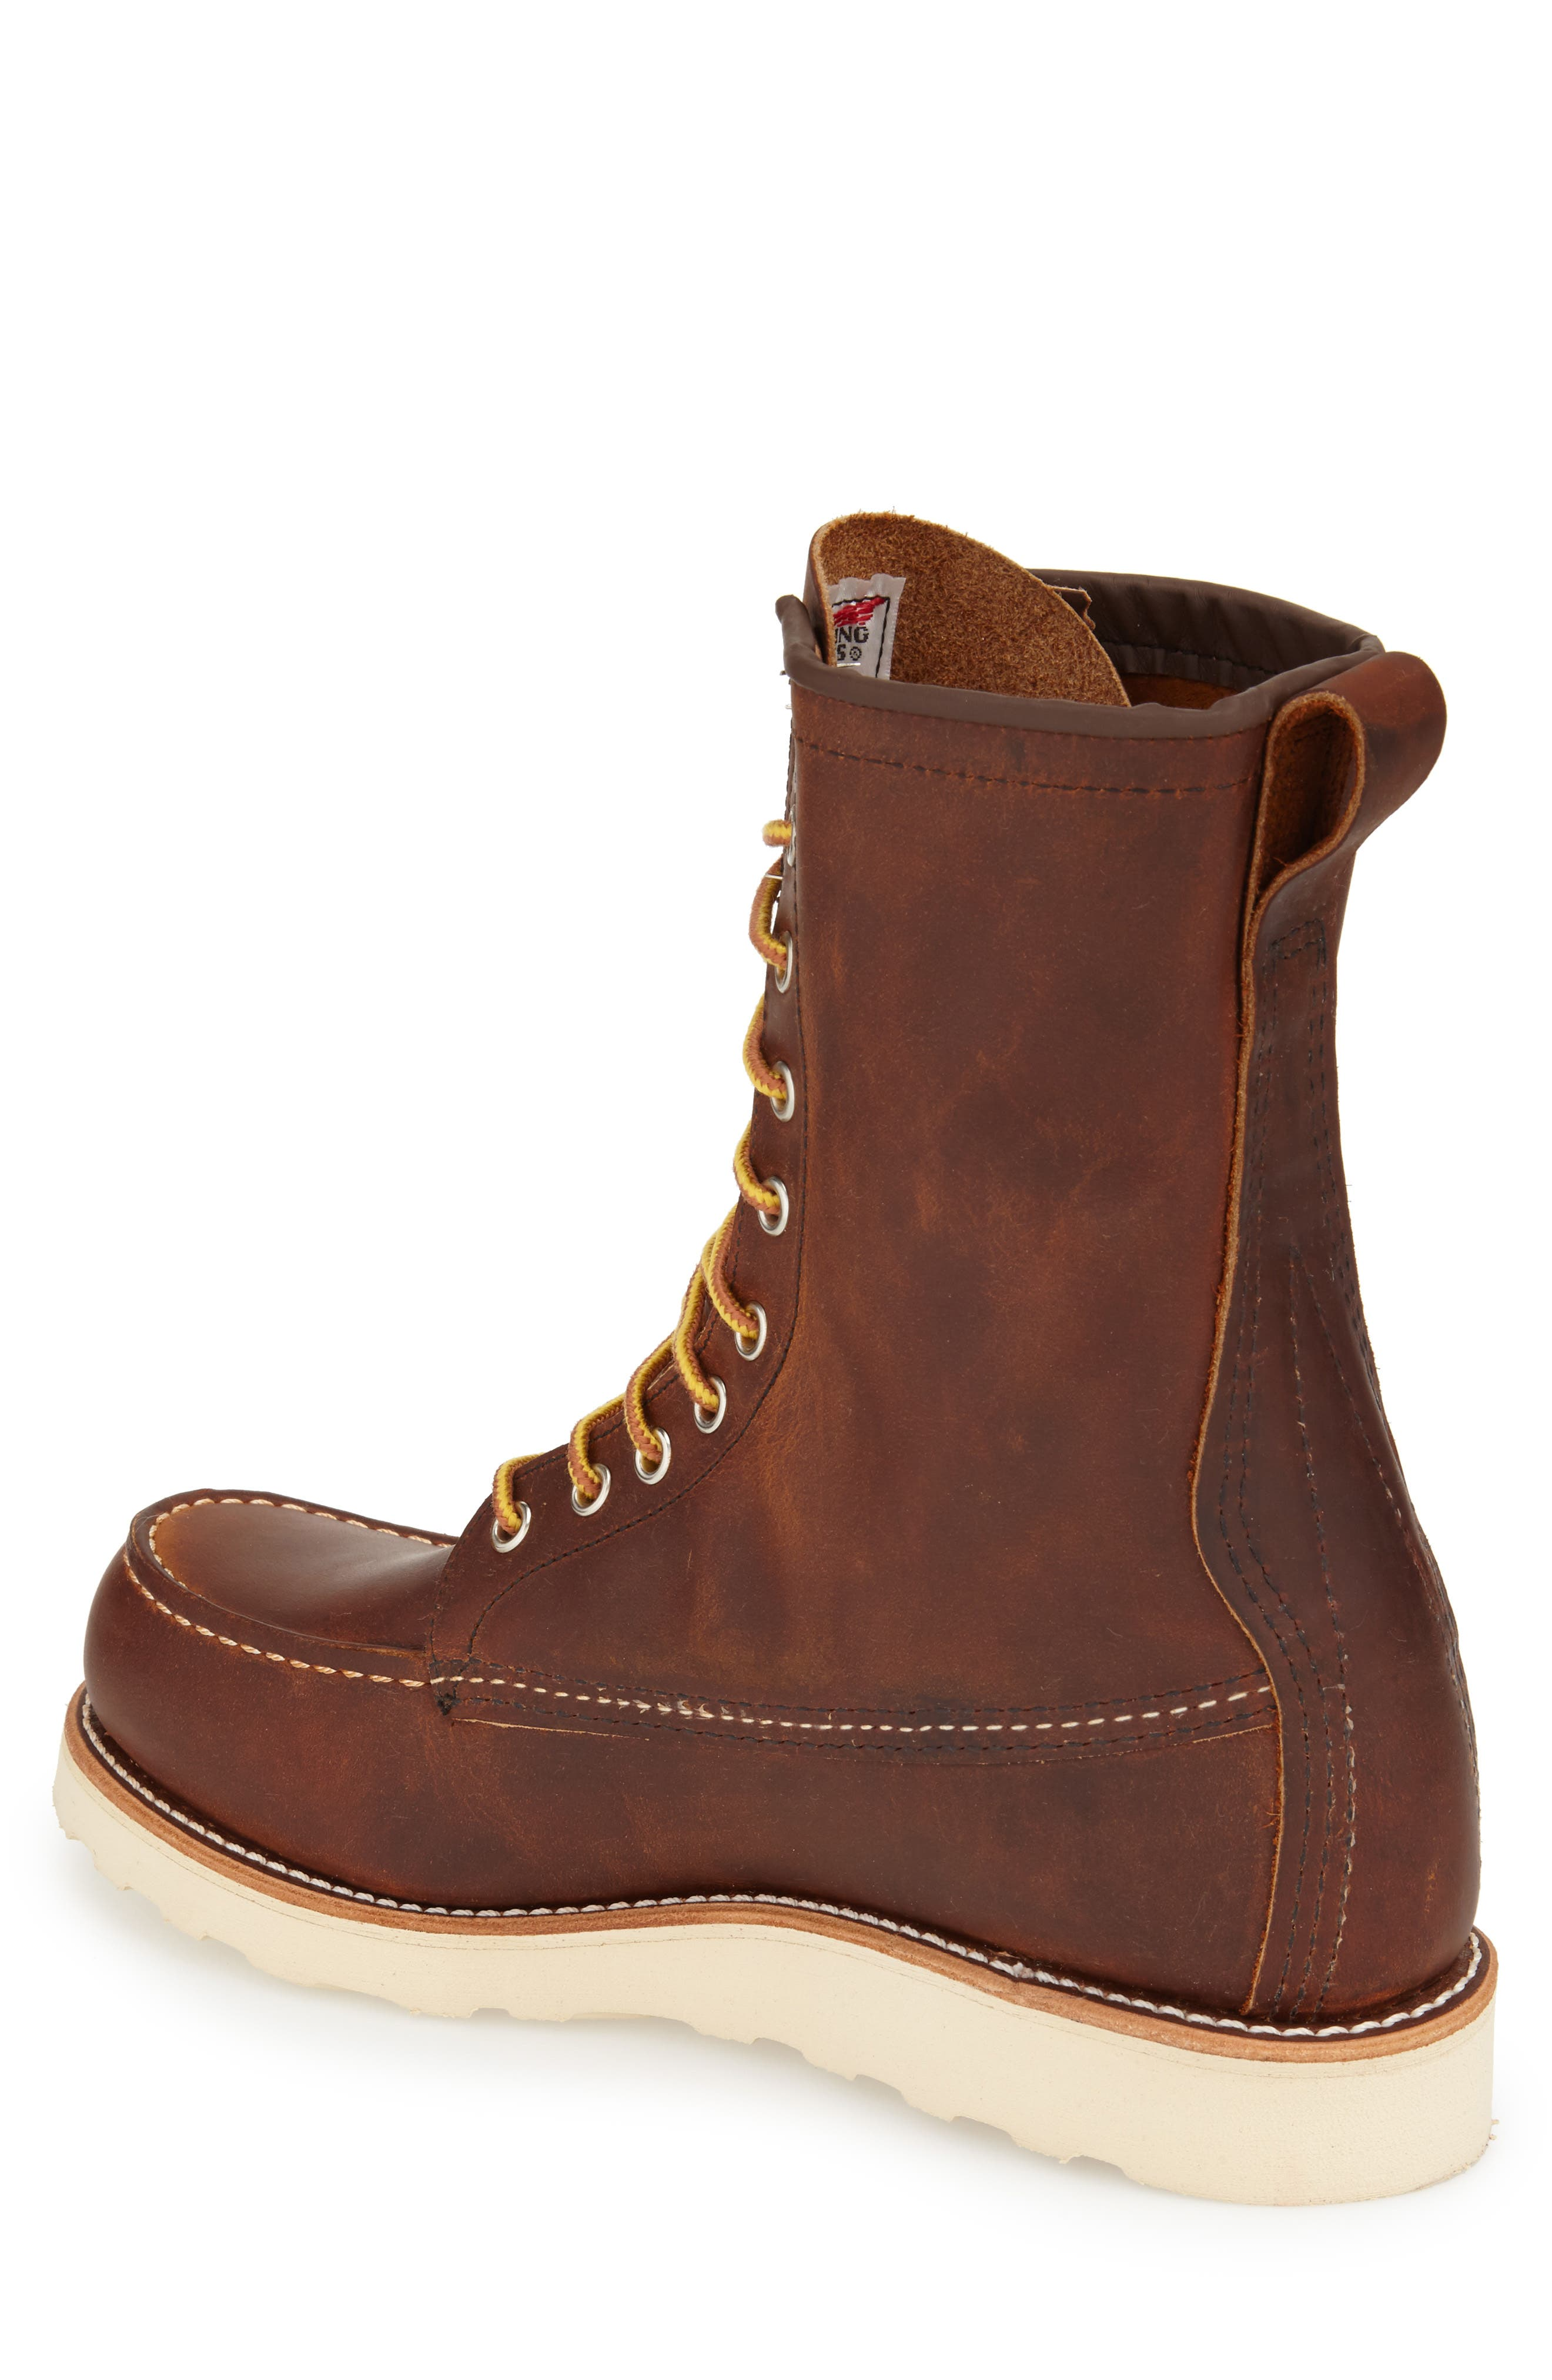 '877' Moc Toe Boot,                             Alternate thumbnail 2, color,                             COPPER LEATHER